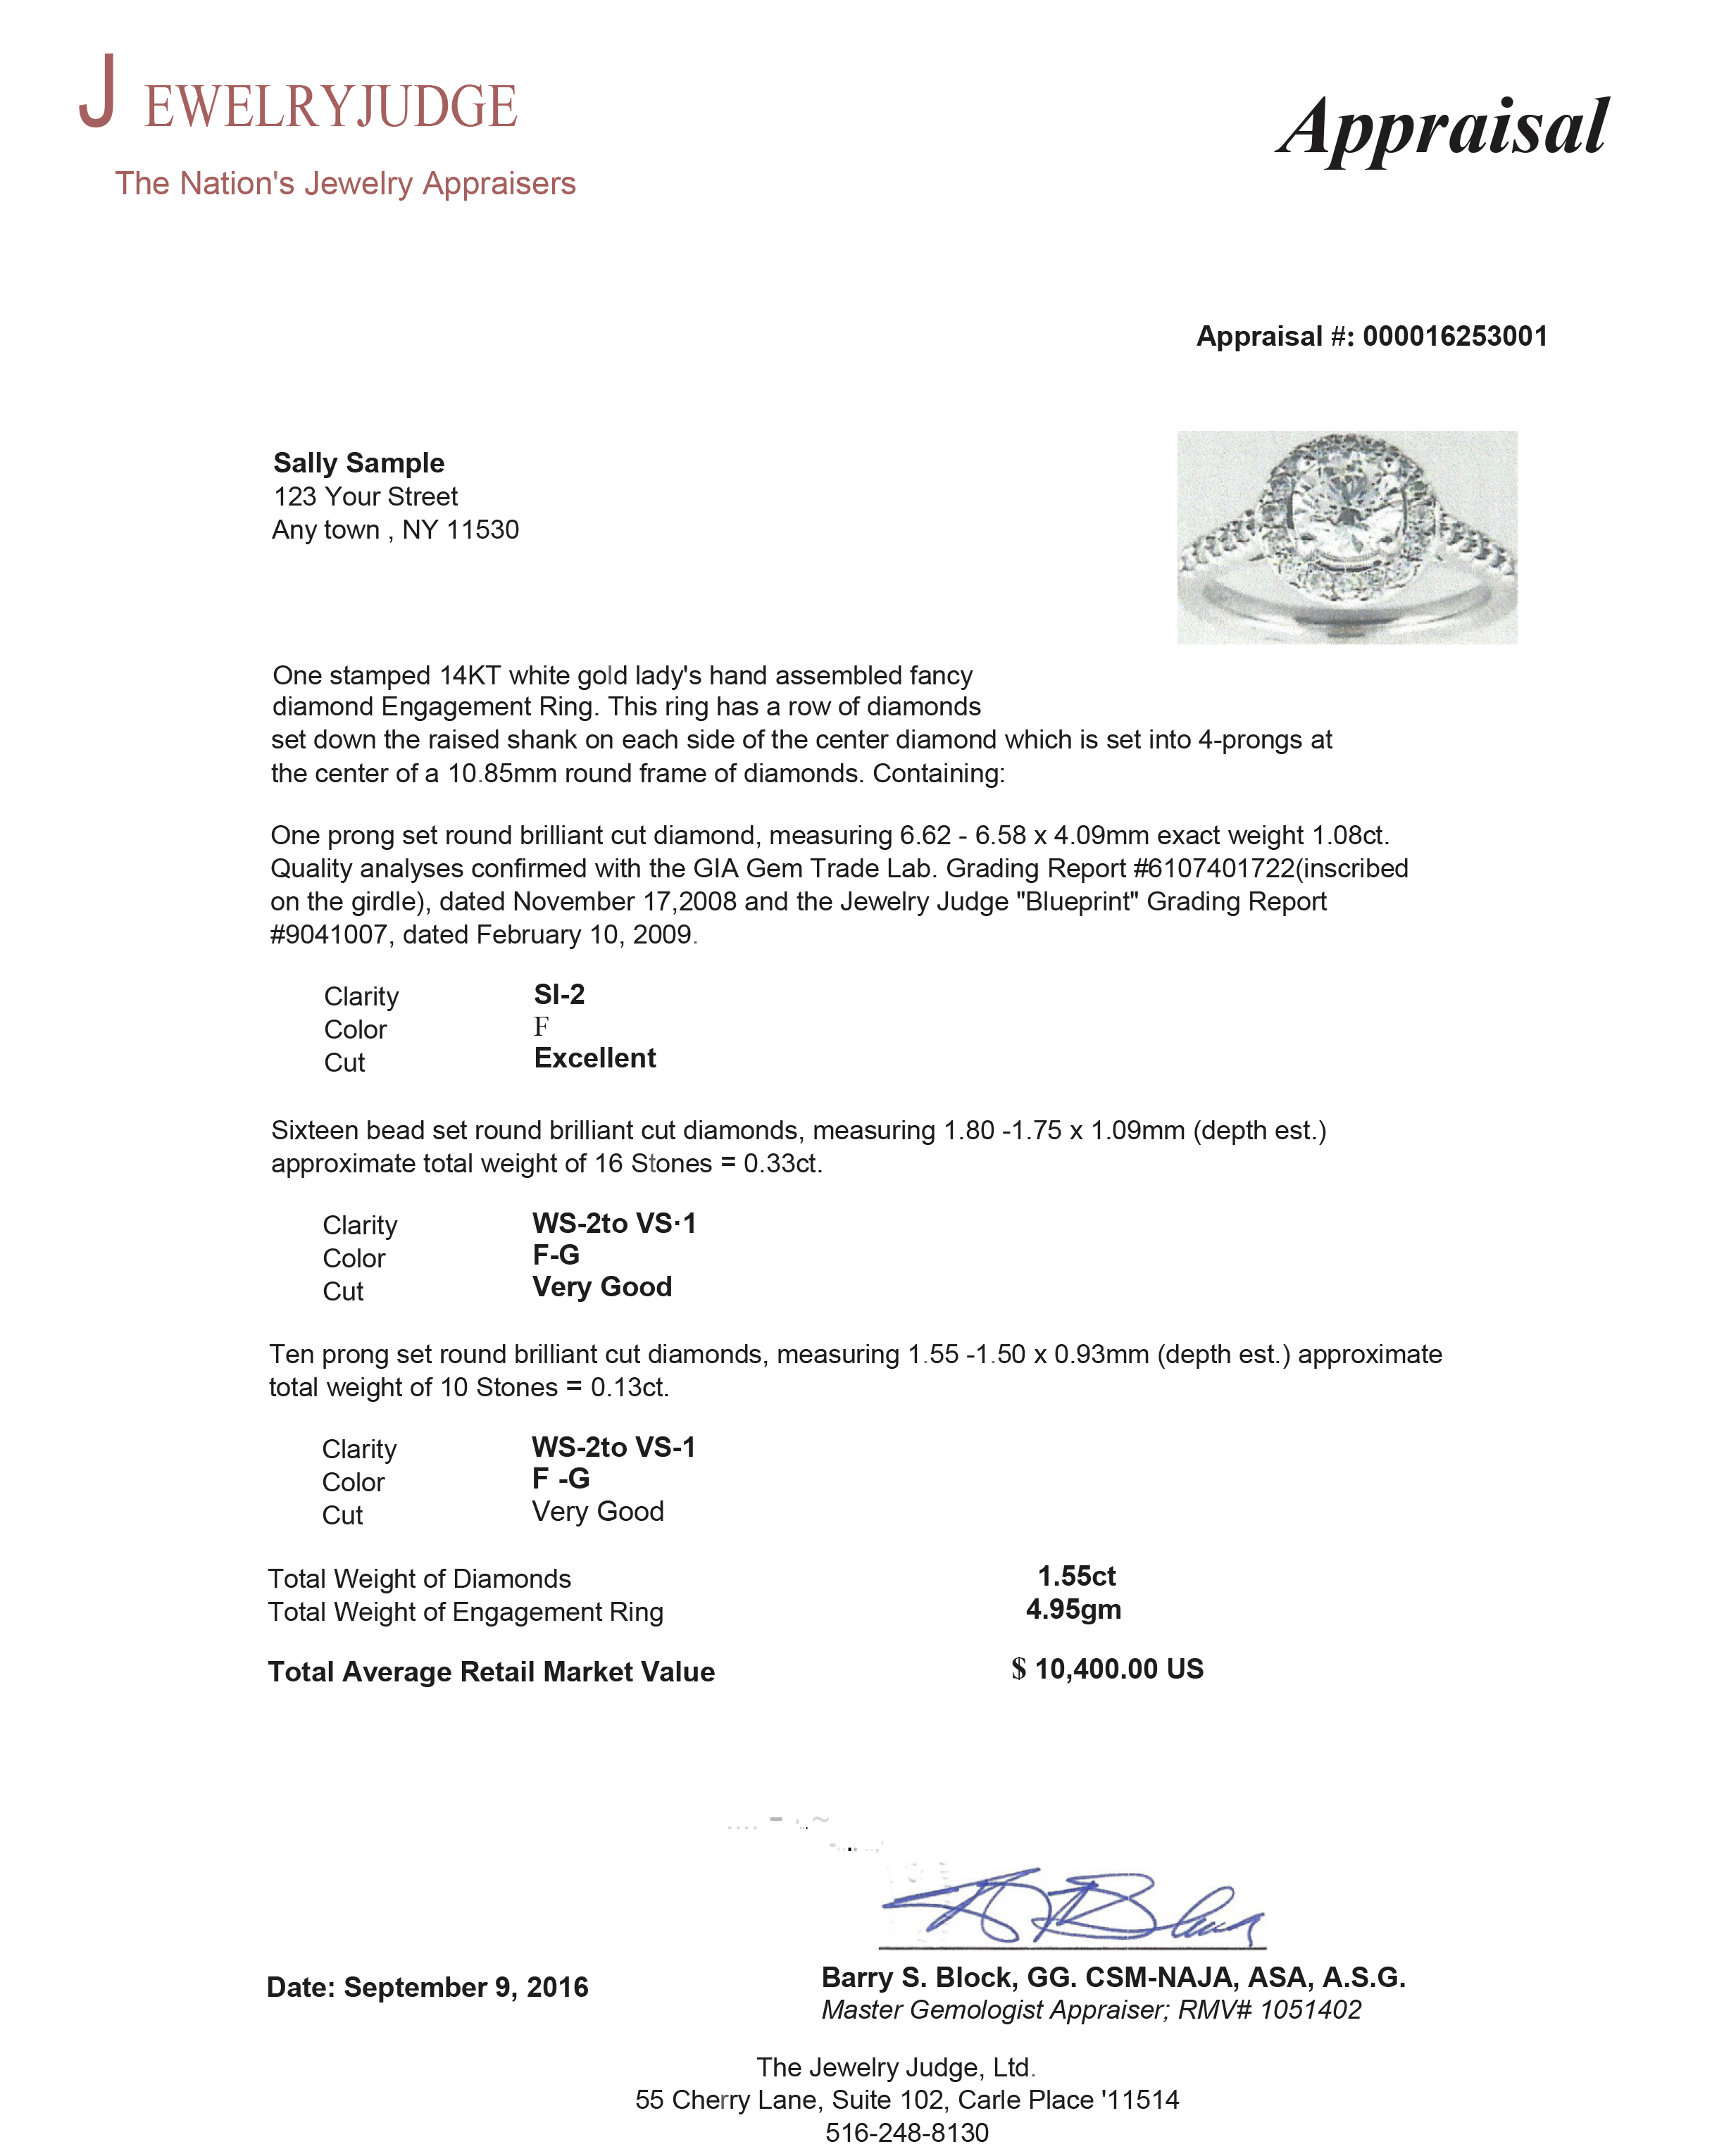 Jewelry Appraisal Sample